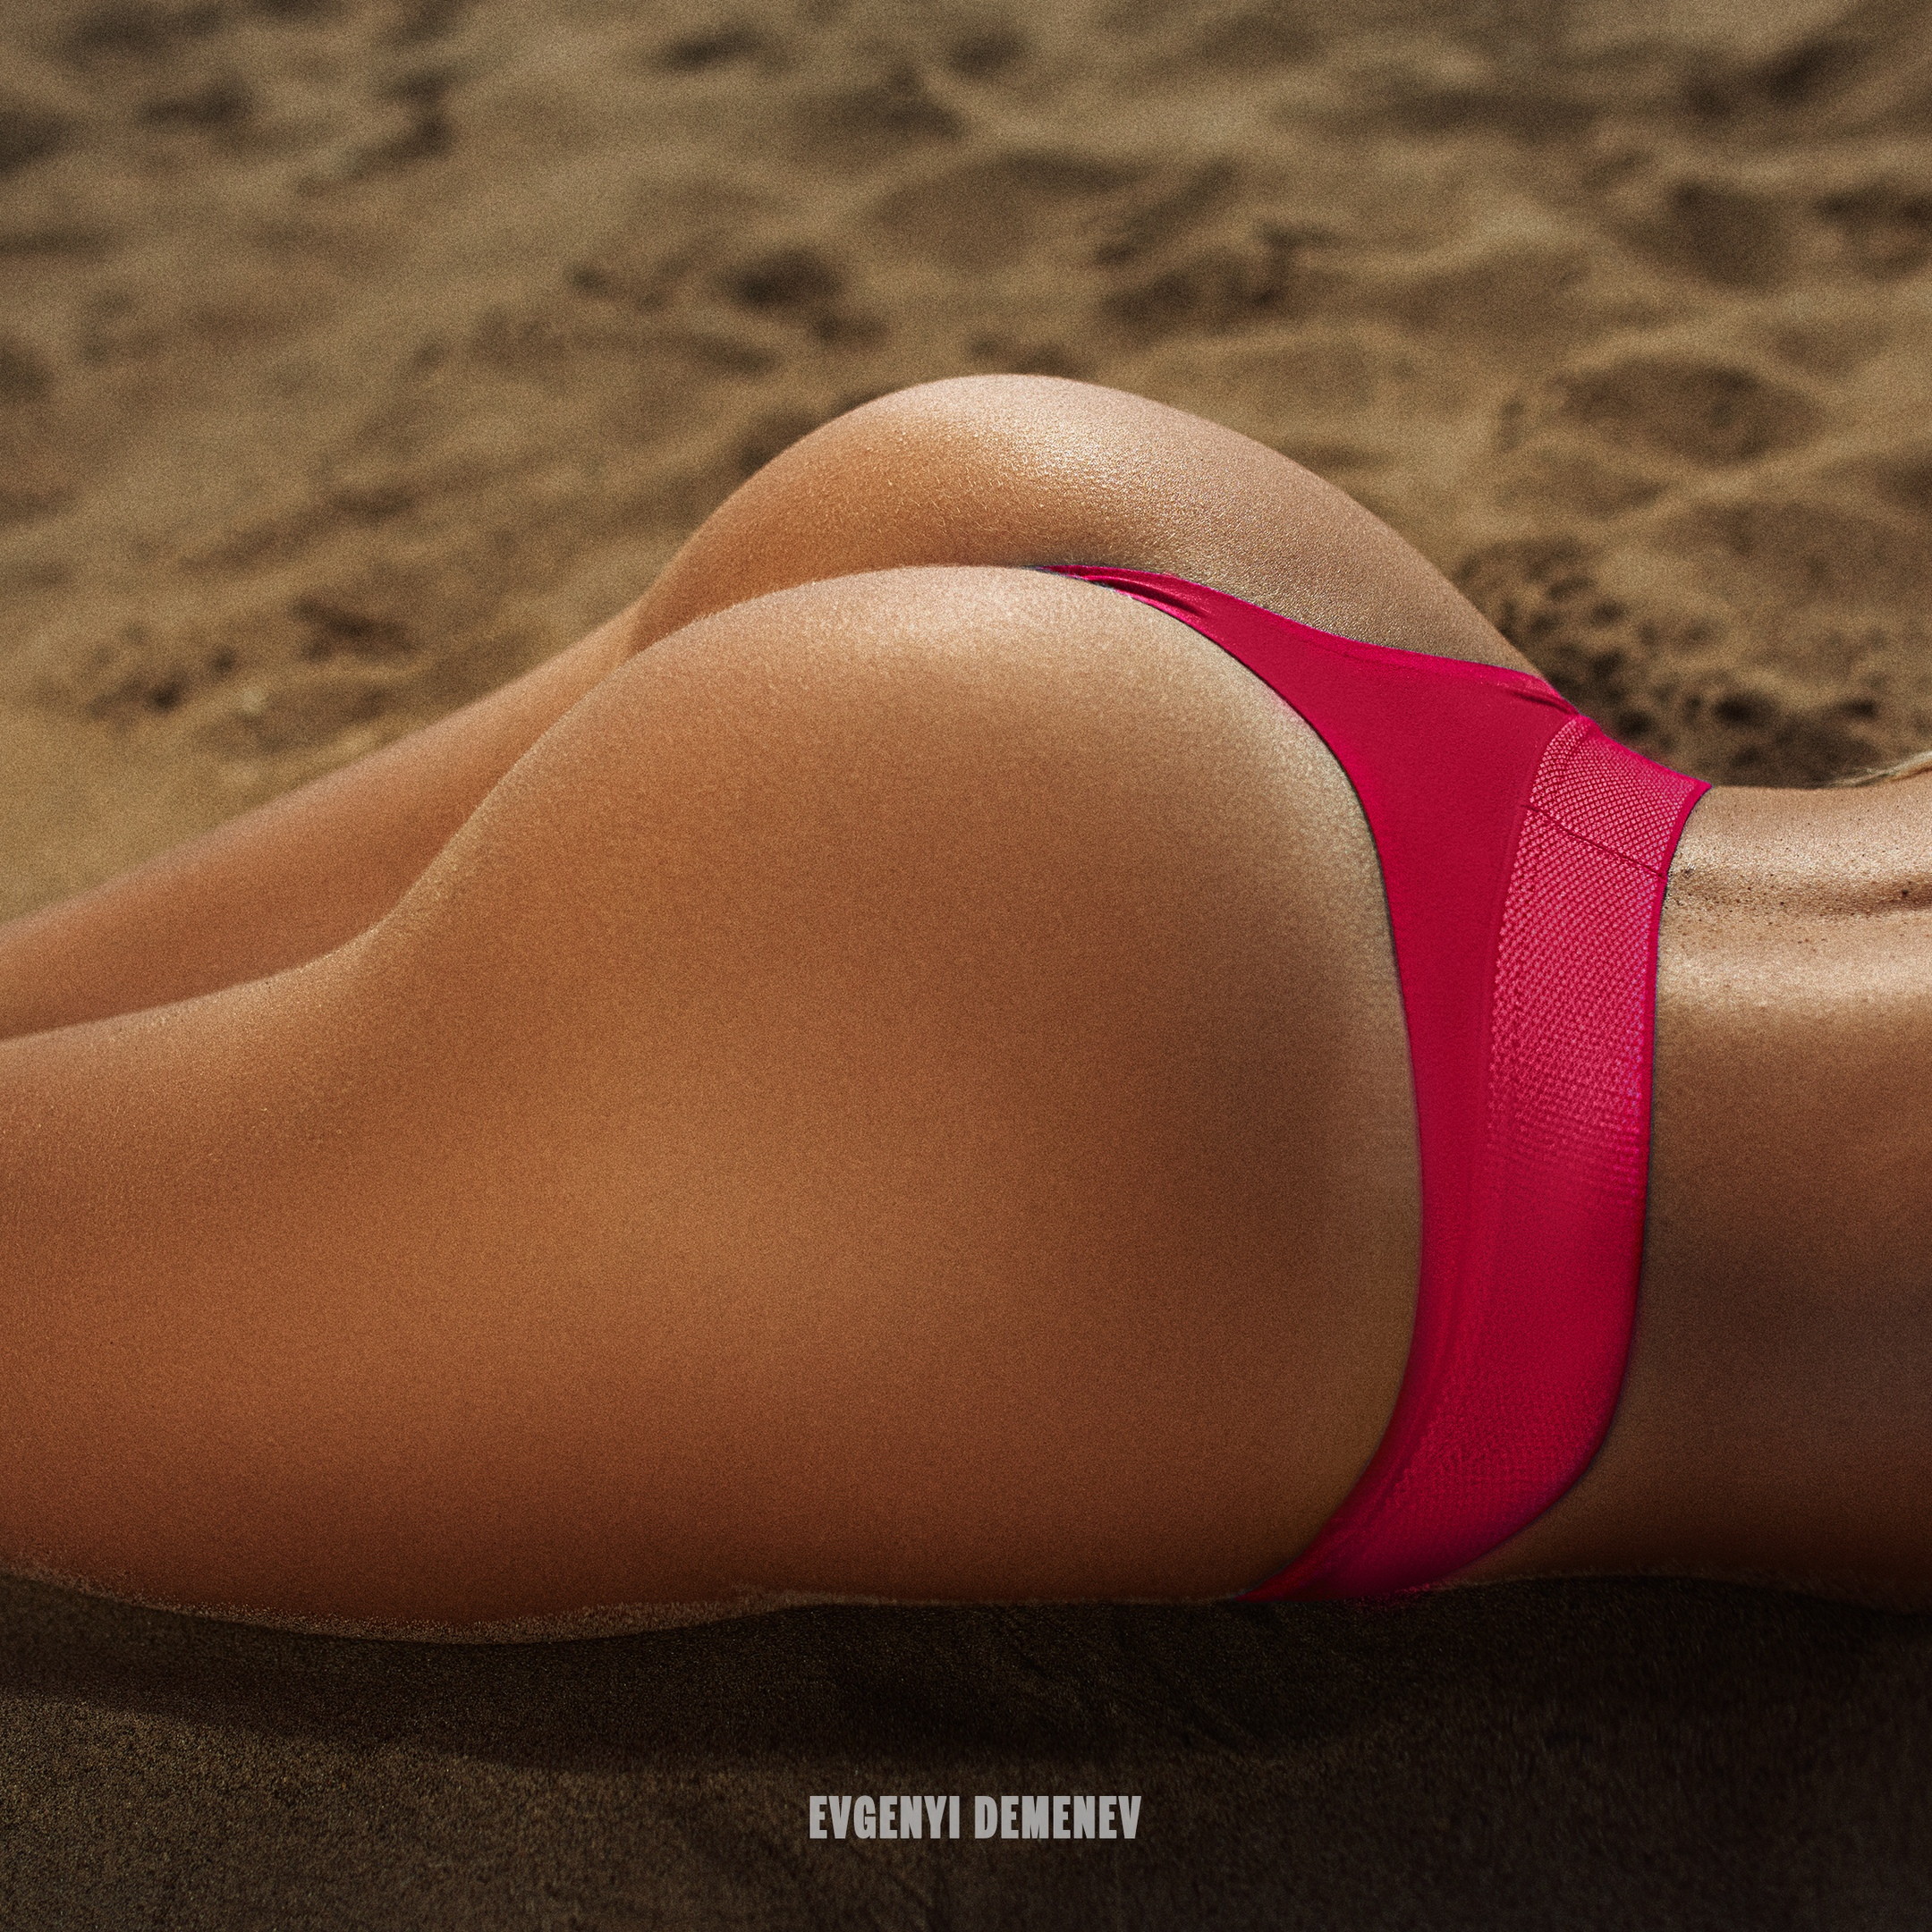 Marika fruscio topless